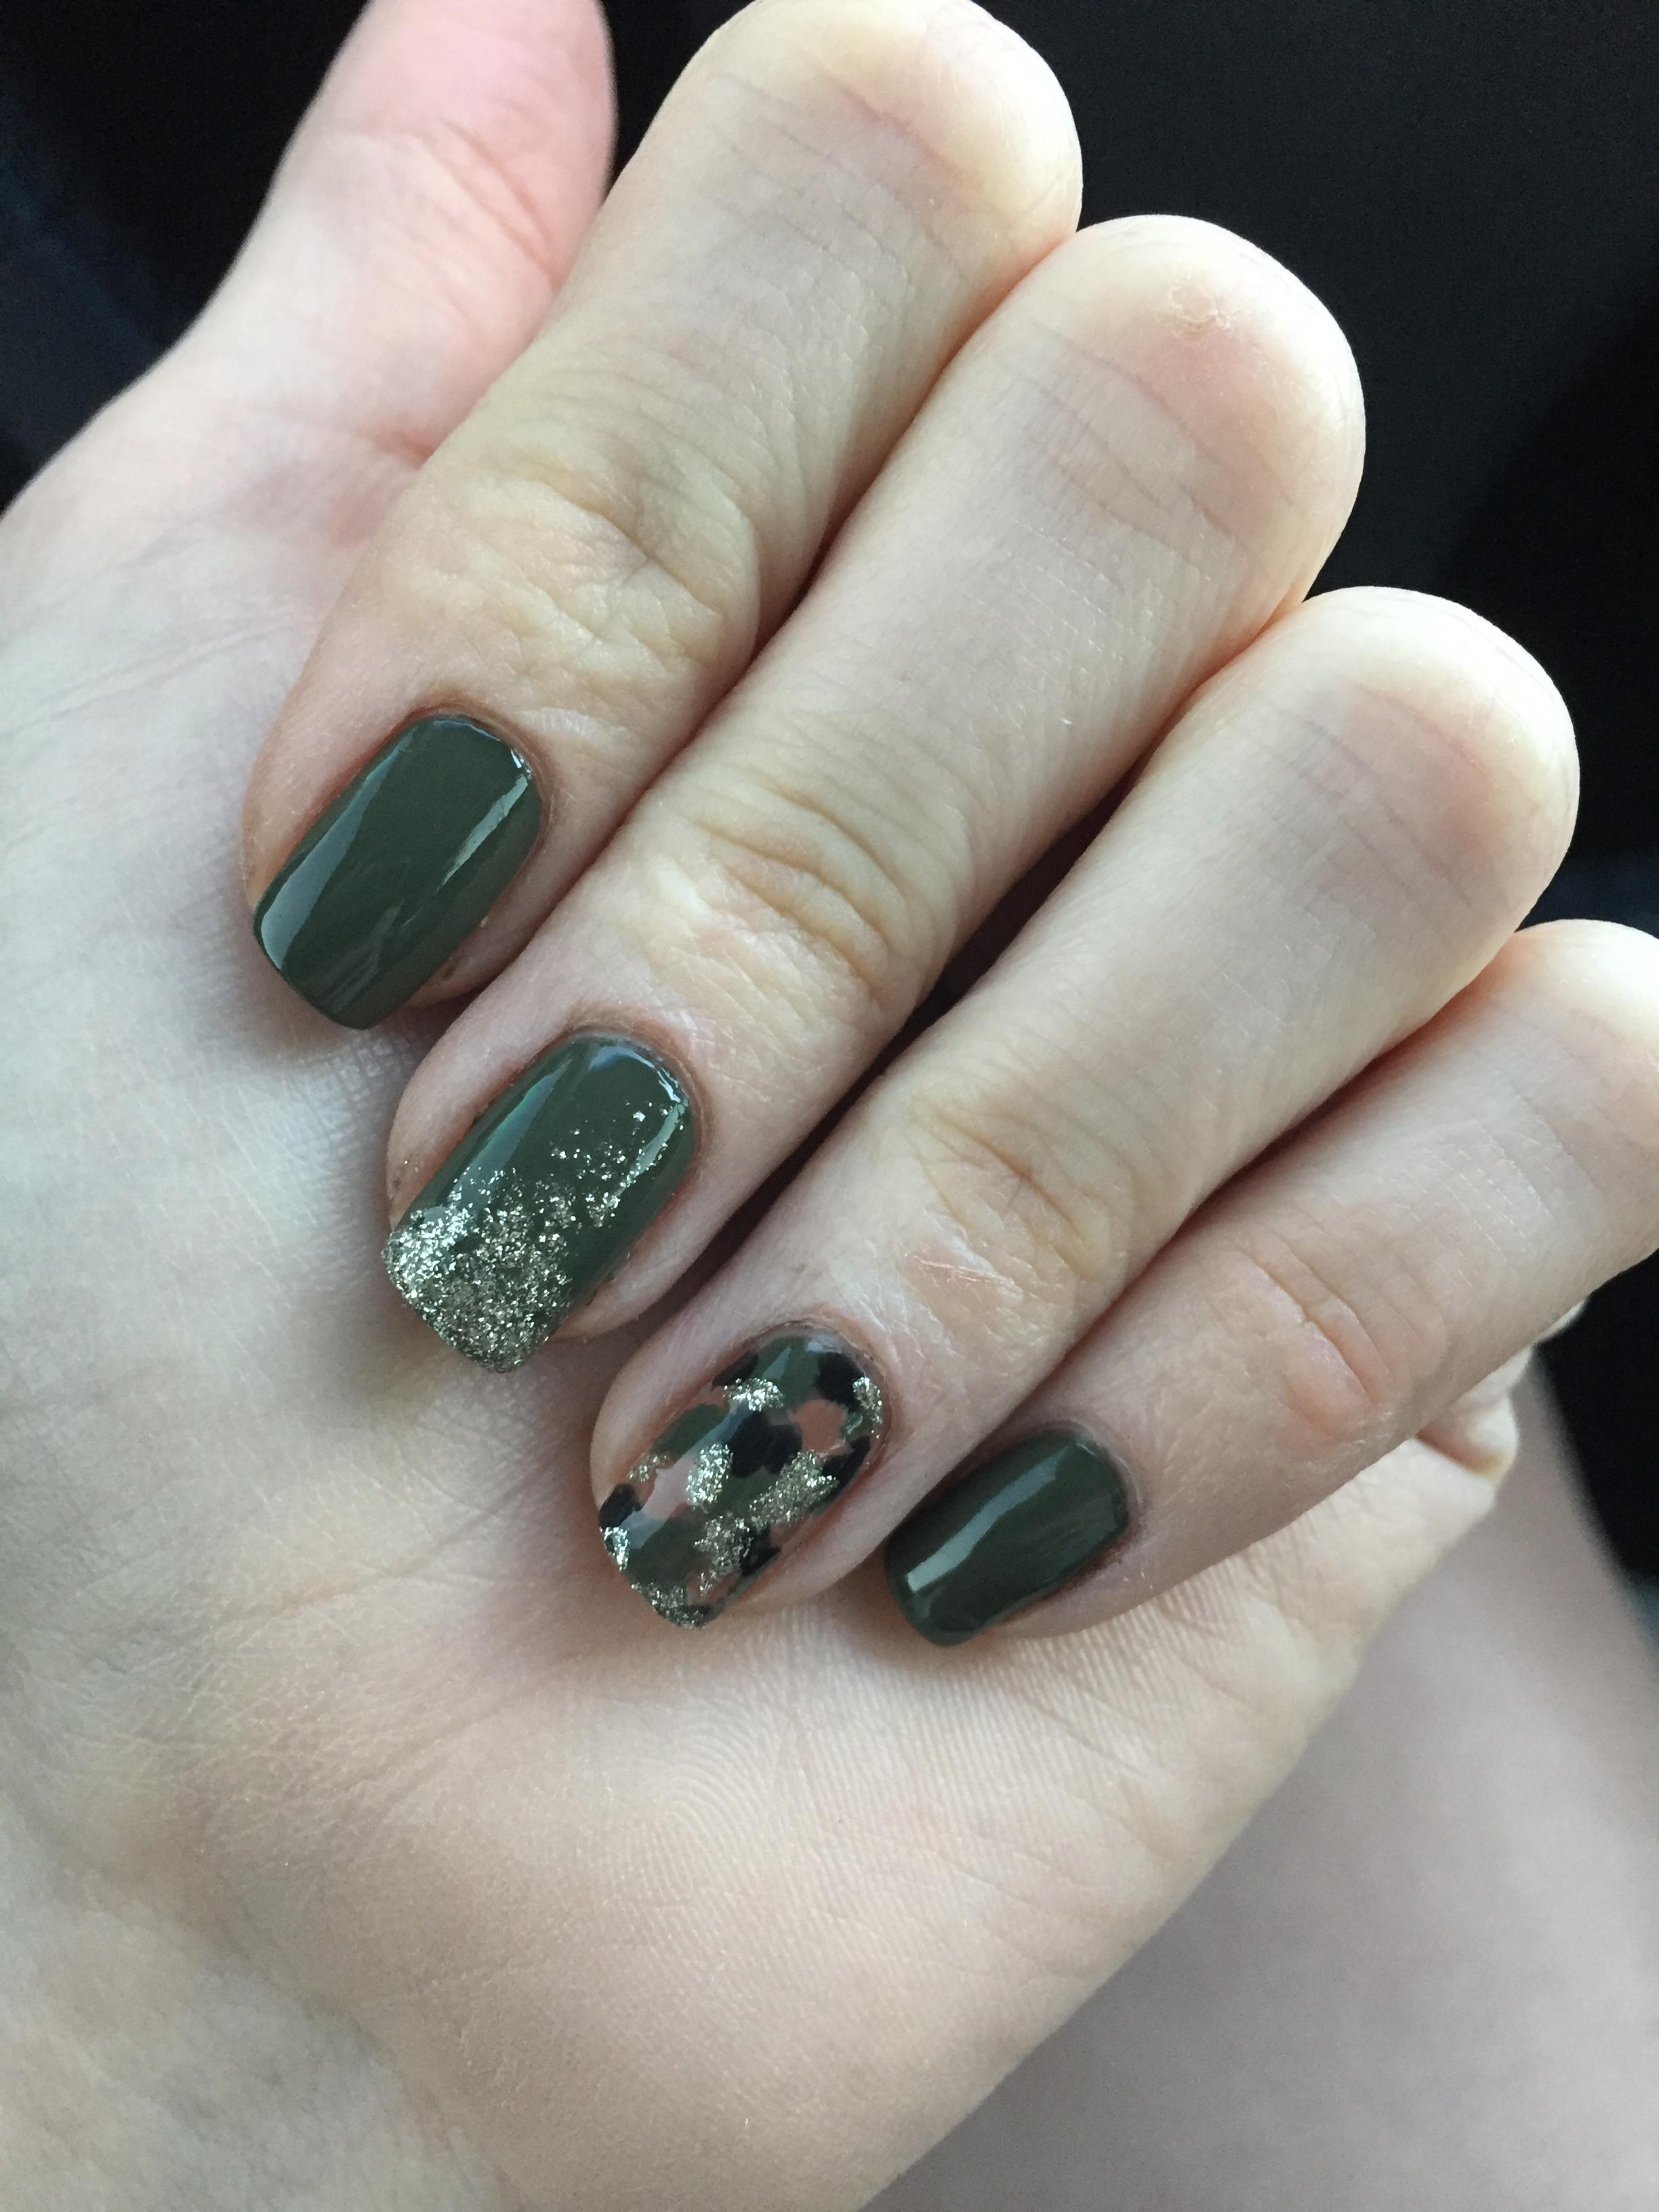 OPI Polish || Suzi - The First Lady of Nails  OPI Glitter || Baroque... But Still Shopping